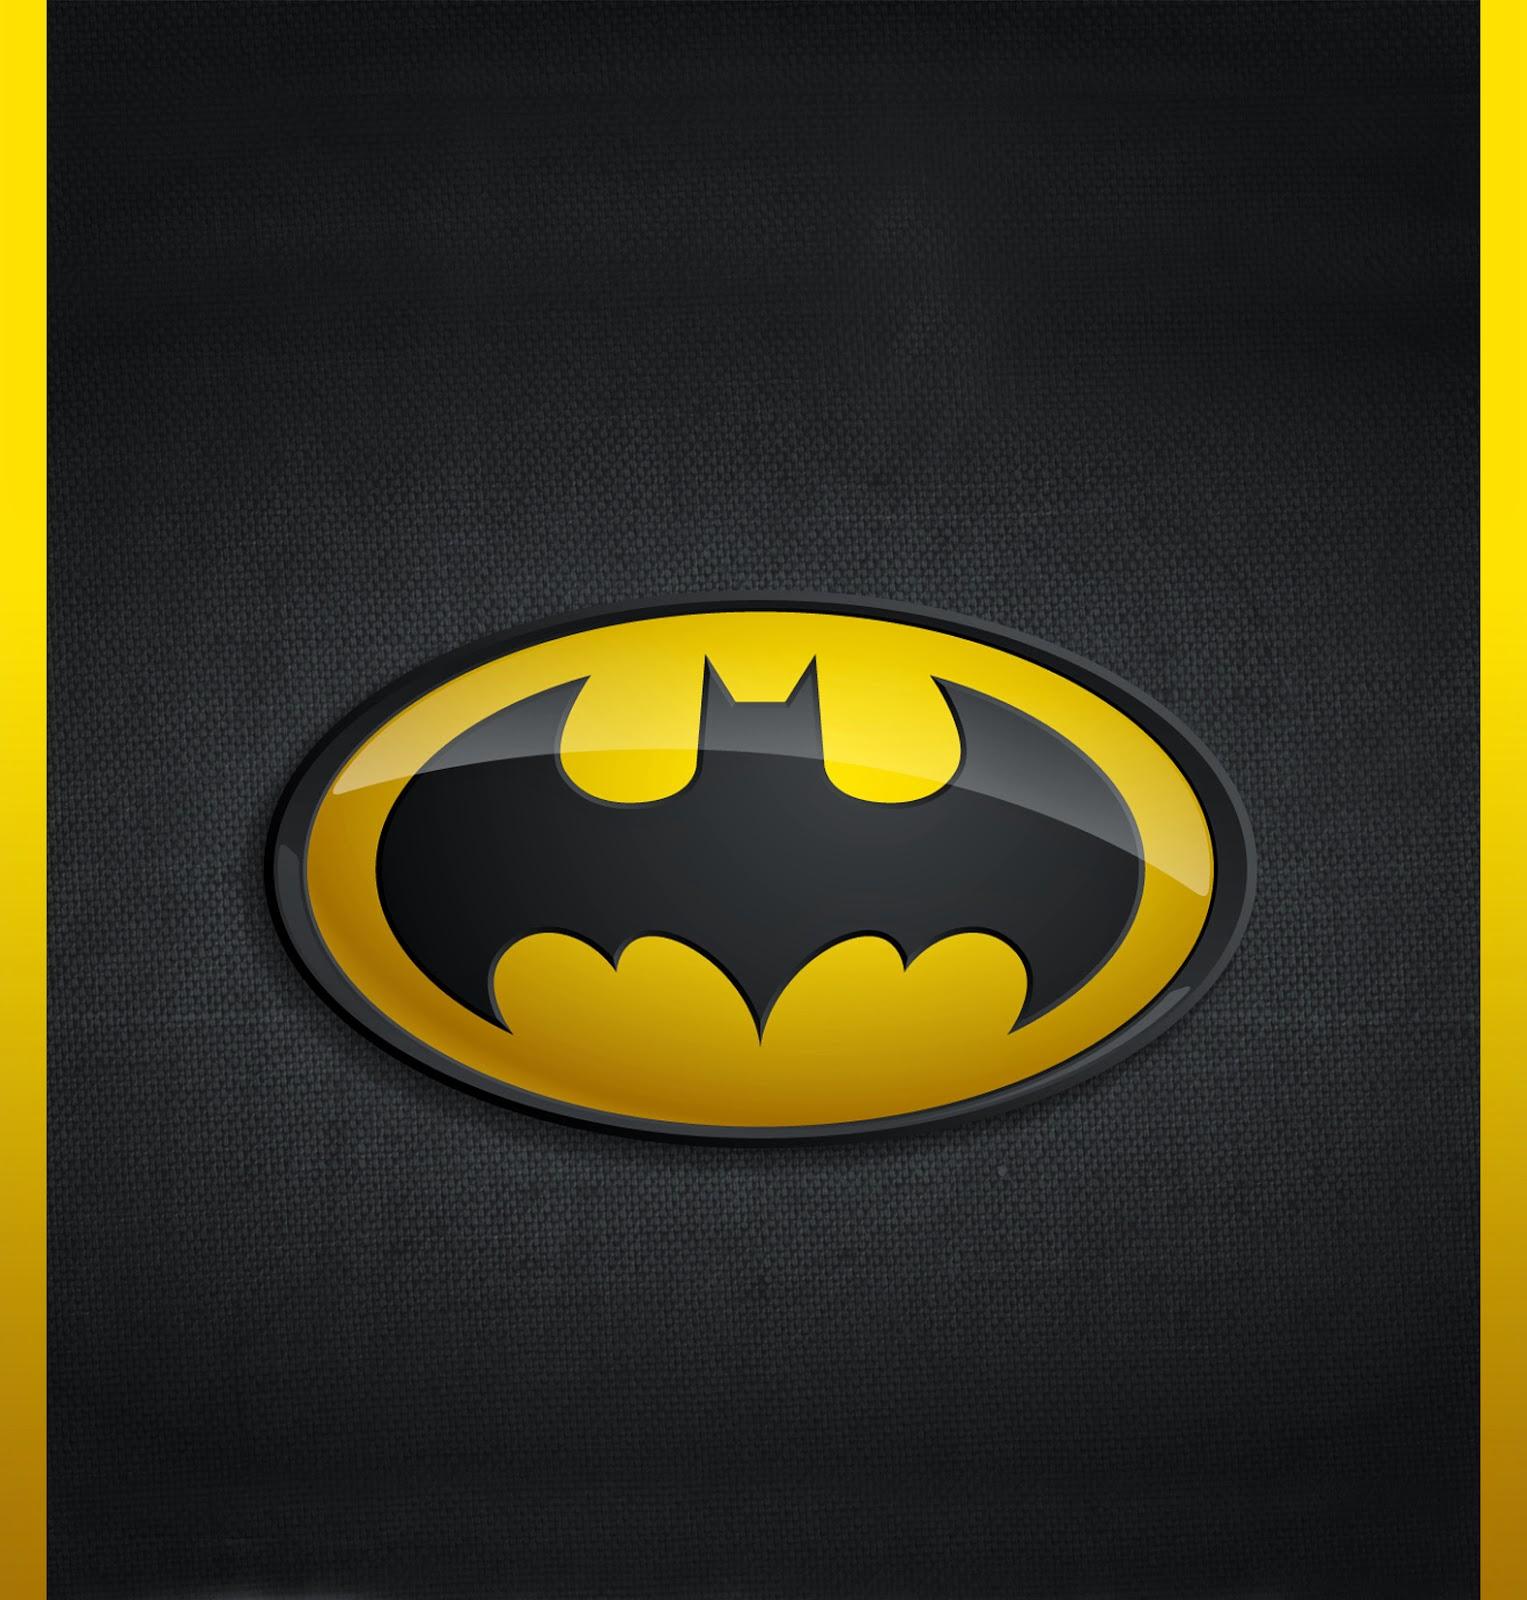 Batman 001 batman free printable boxes is it for parties? is it free? is,Batman Invitations Free